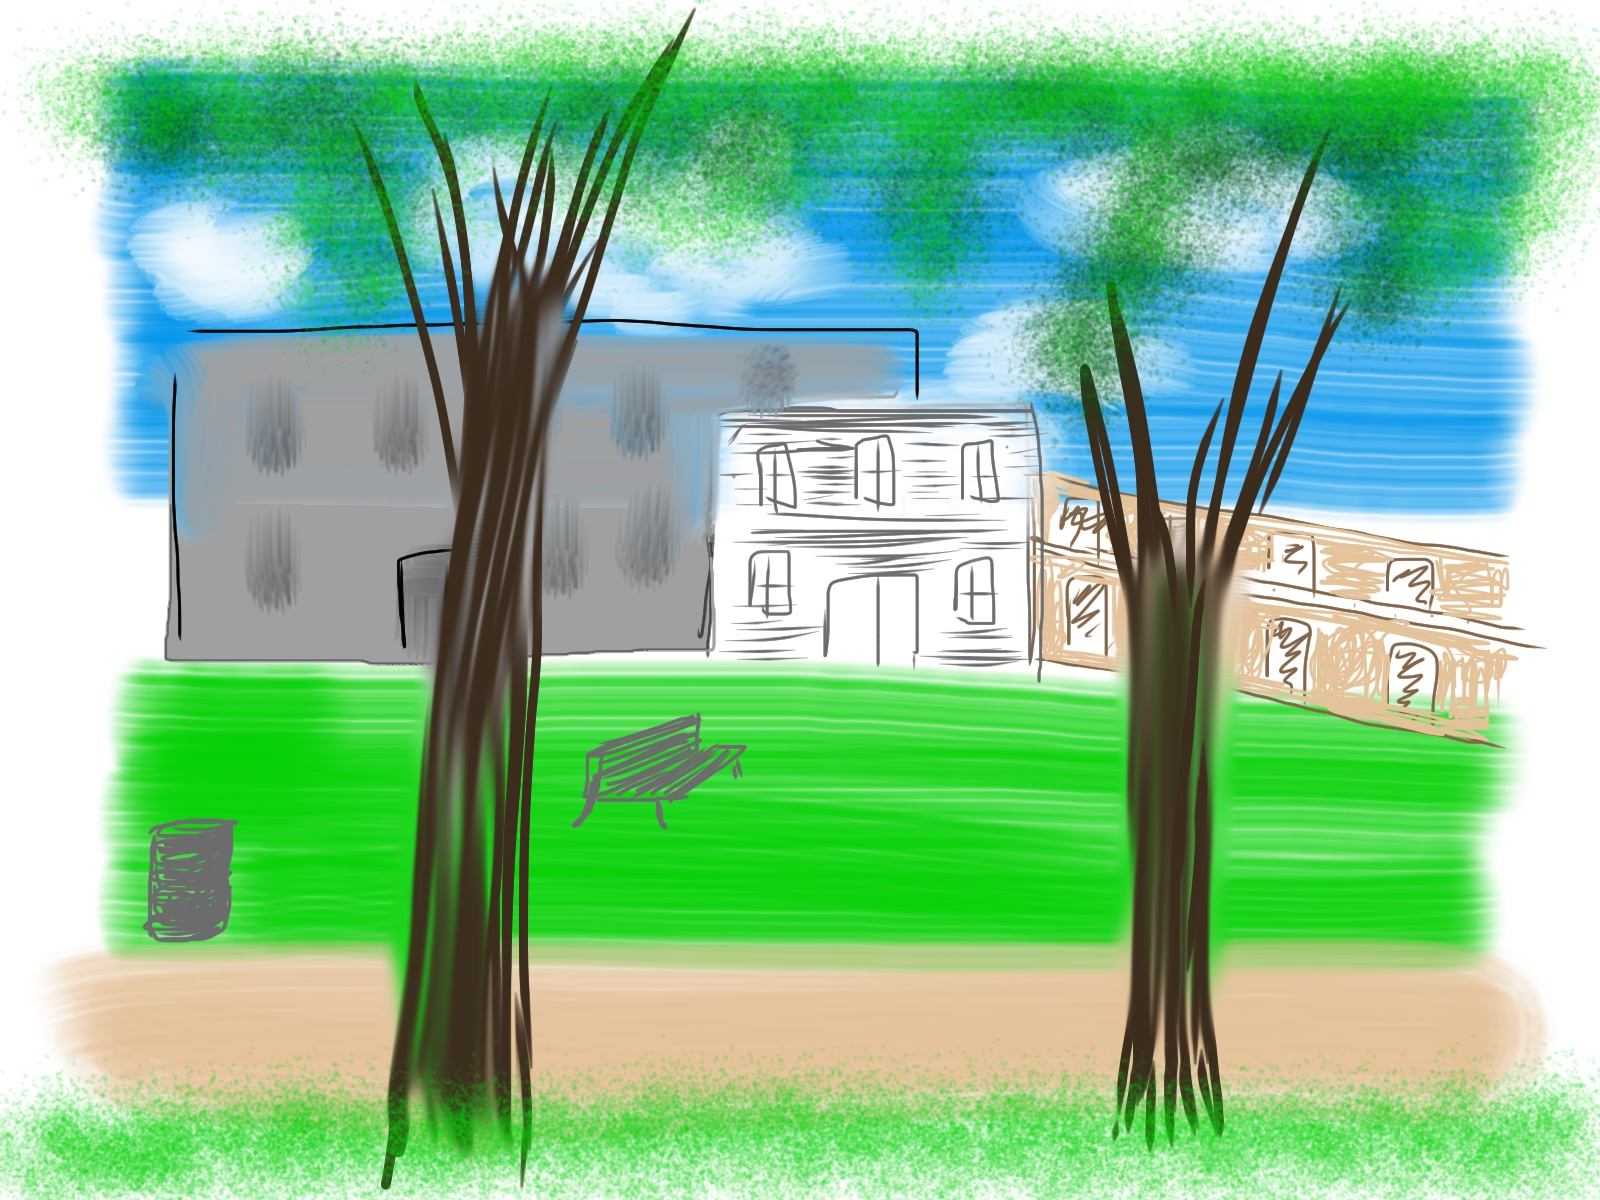 Corporate Greenspace